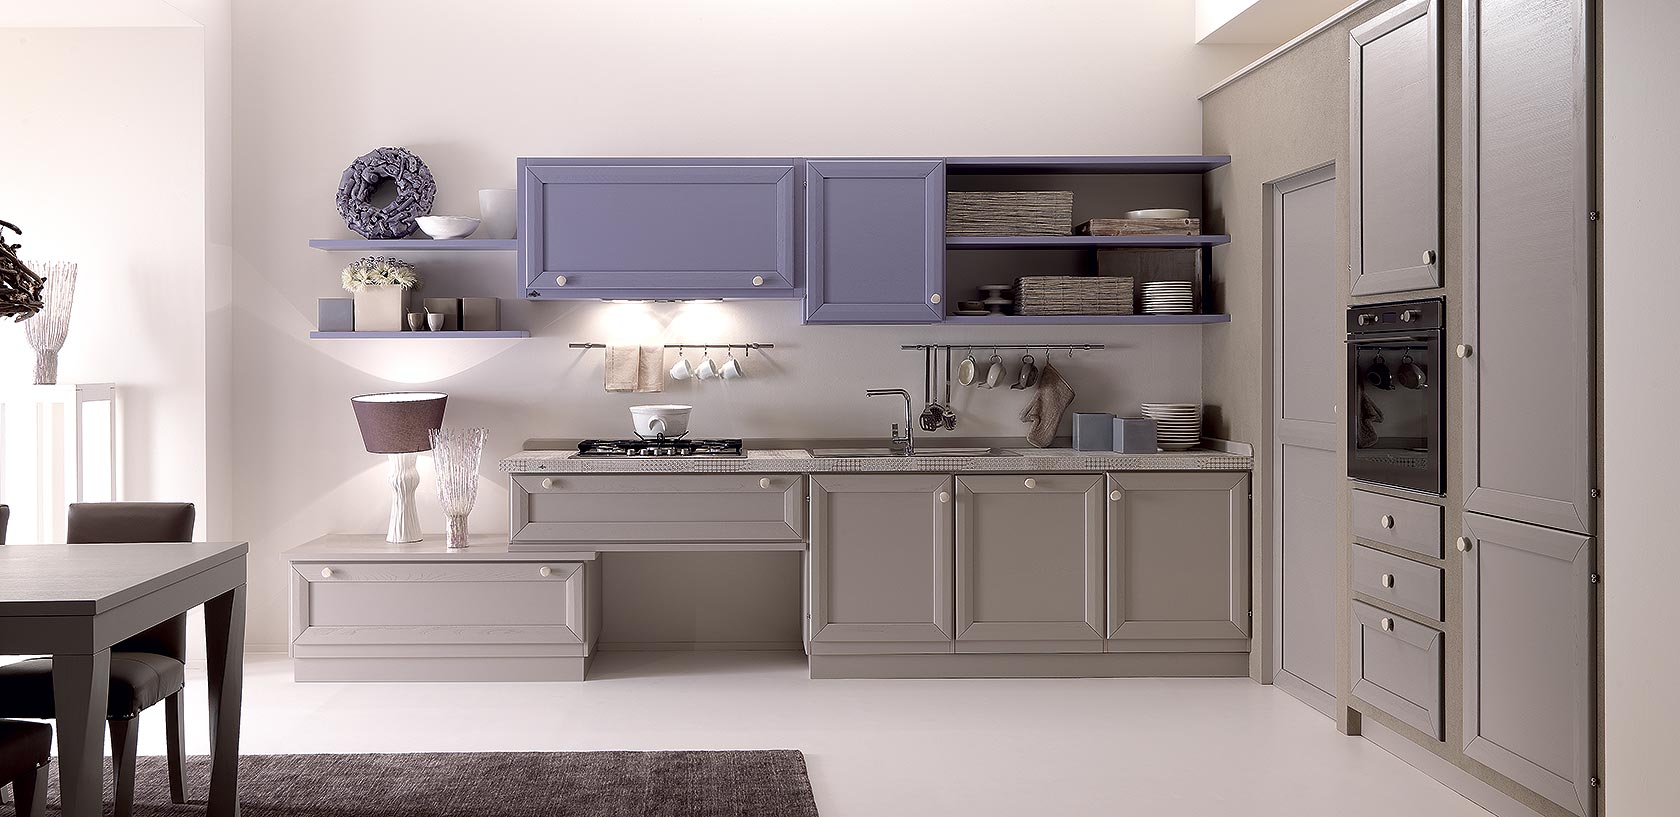 Cucine contemporanee zappalorto cortigiana grigio crema - Cucina grigio tortora ...